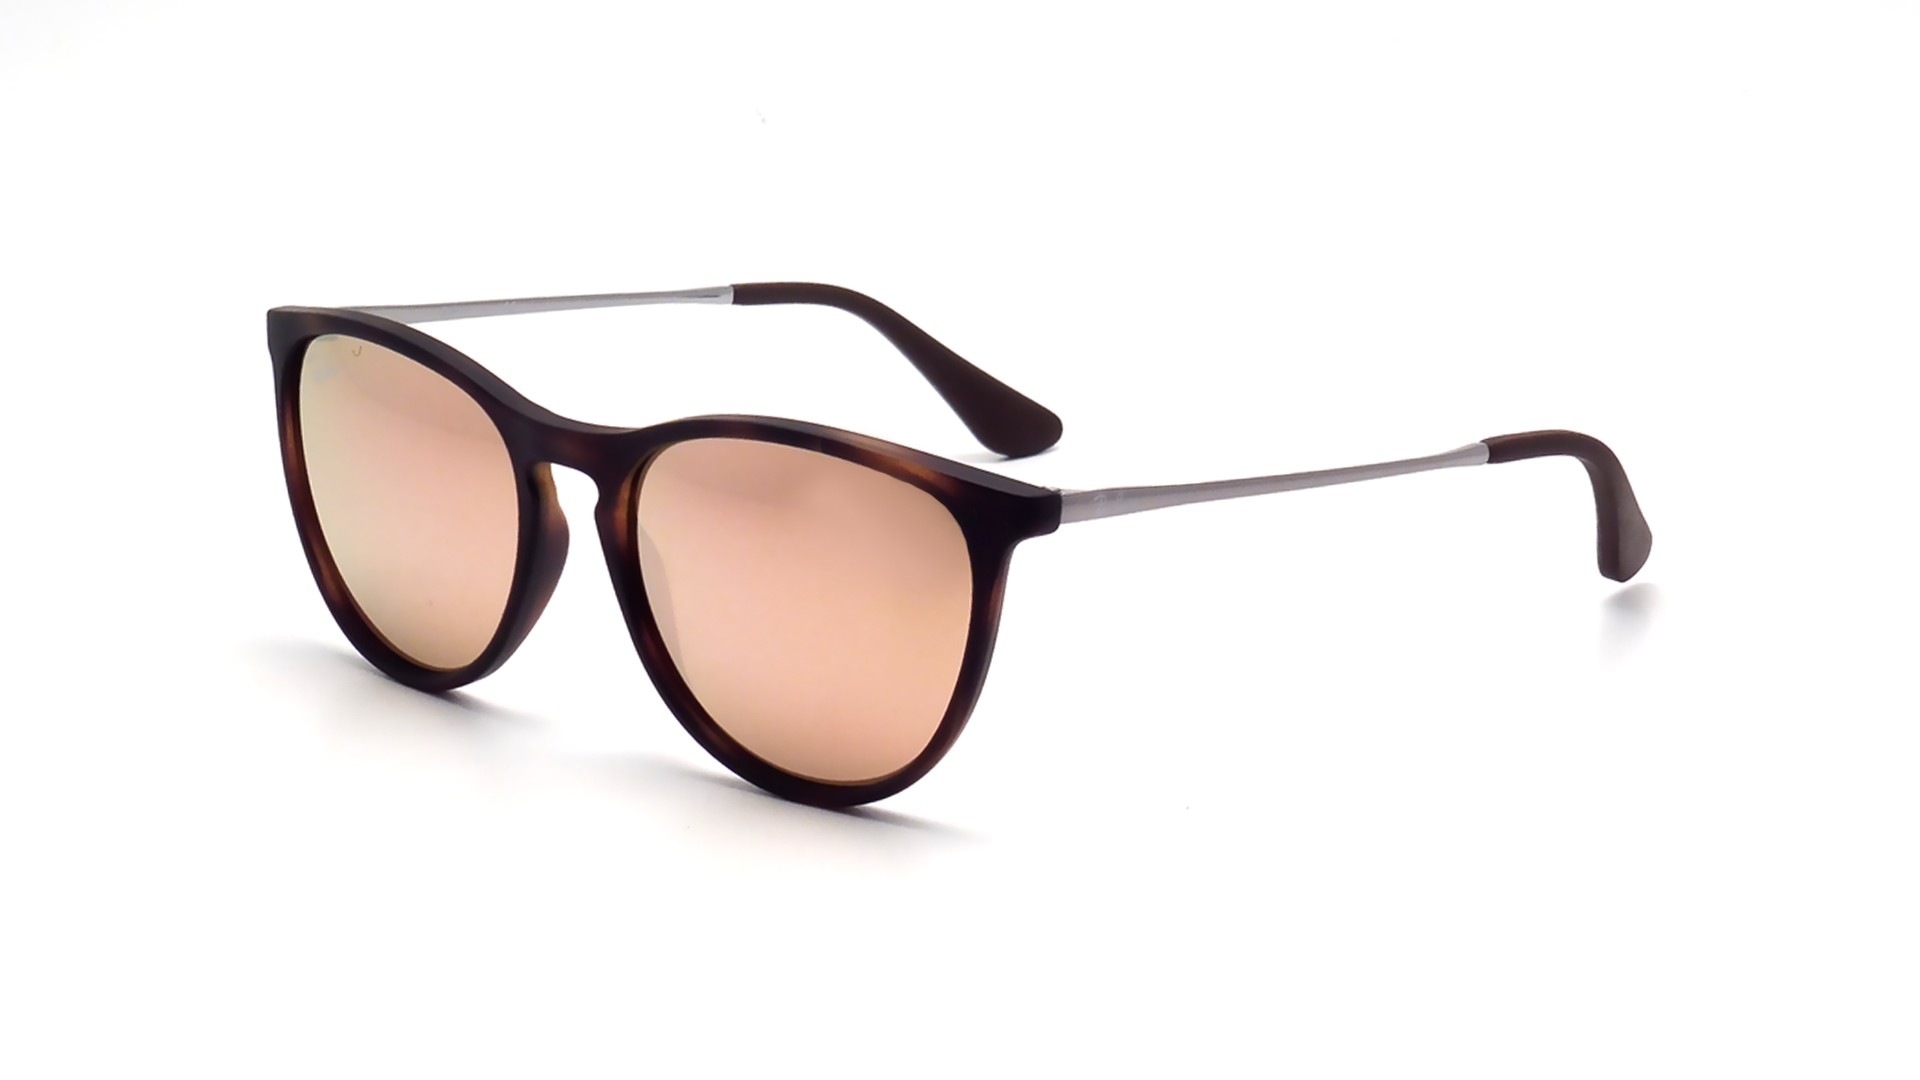 10c8d7e24d Sunglasses Ray-Ban Erika Havane Tortoise RJ9060S 70062Y 50-15 Junior Mirror